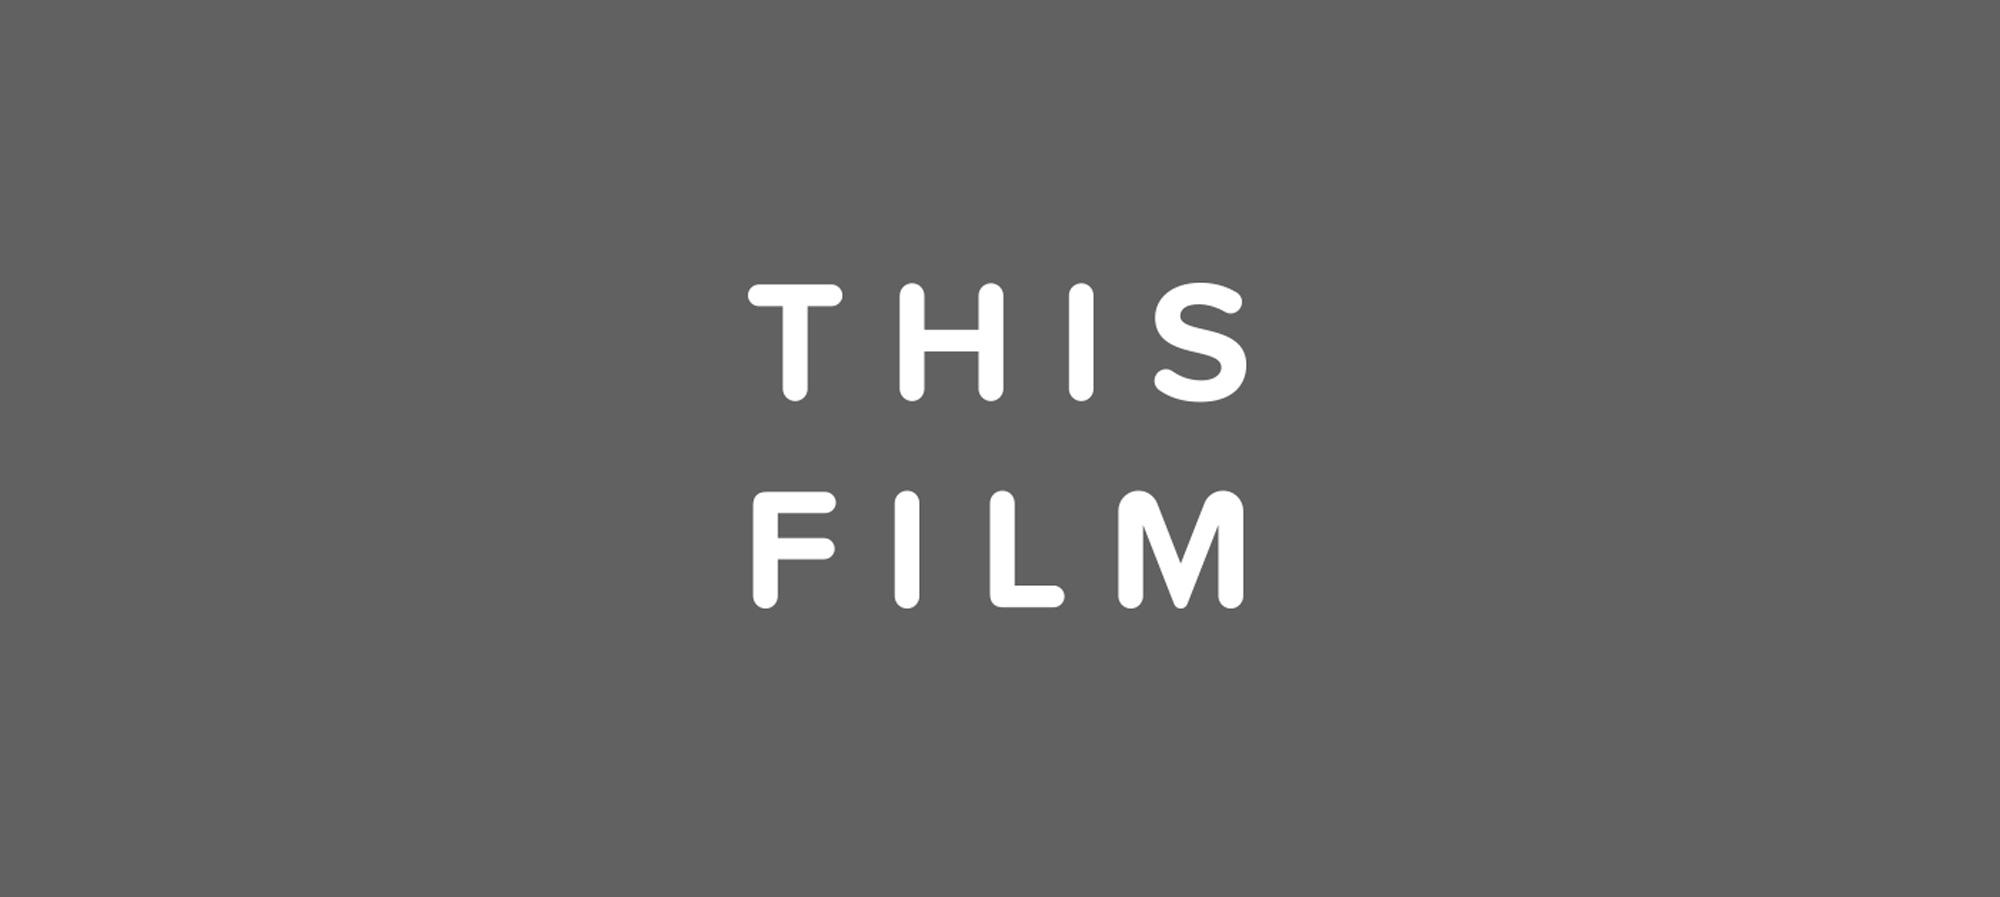 Buttercrumble-This-Film-Logo-4.jpg